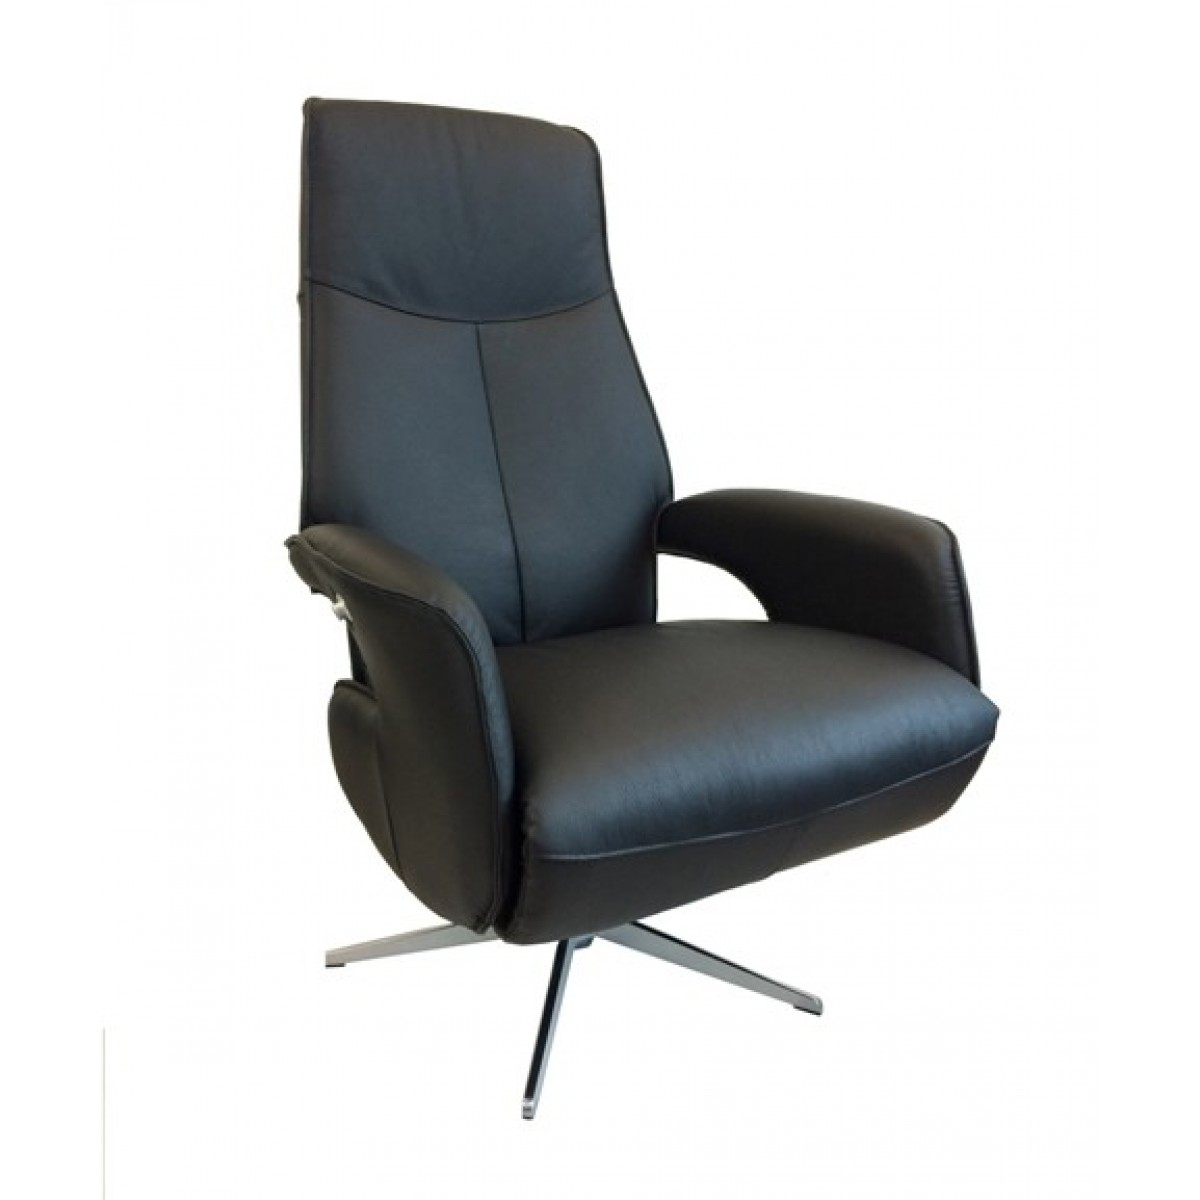 Relaxsessel elektrisch  Sherman relaxsessel | Hjort Knudsen | I Live Design Preisgünstig ...